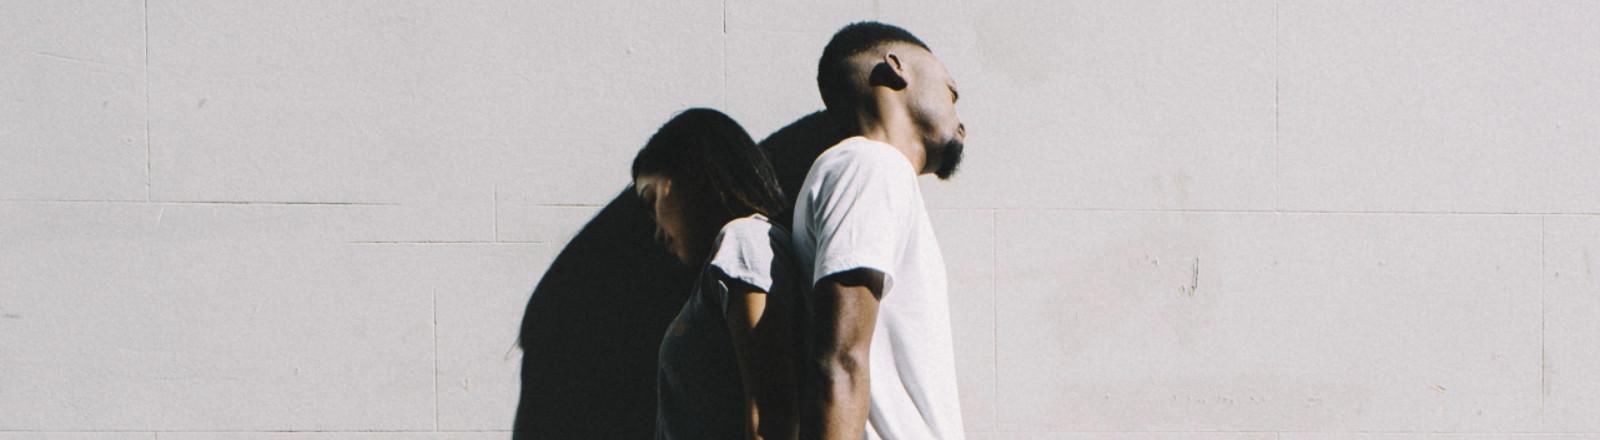 Junges Paar lehnt an einer Mauer